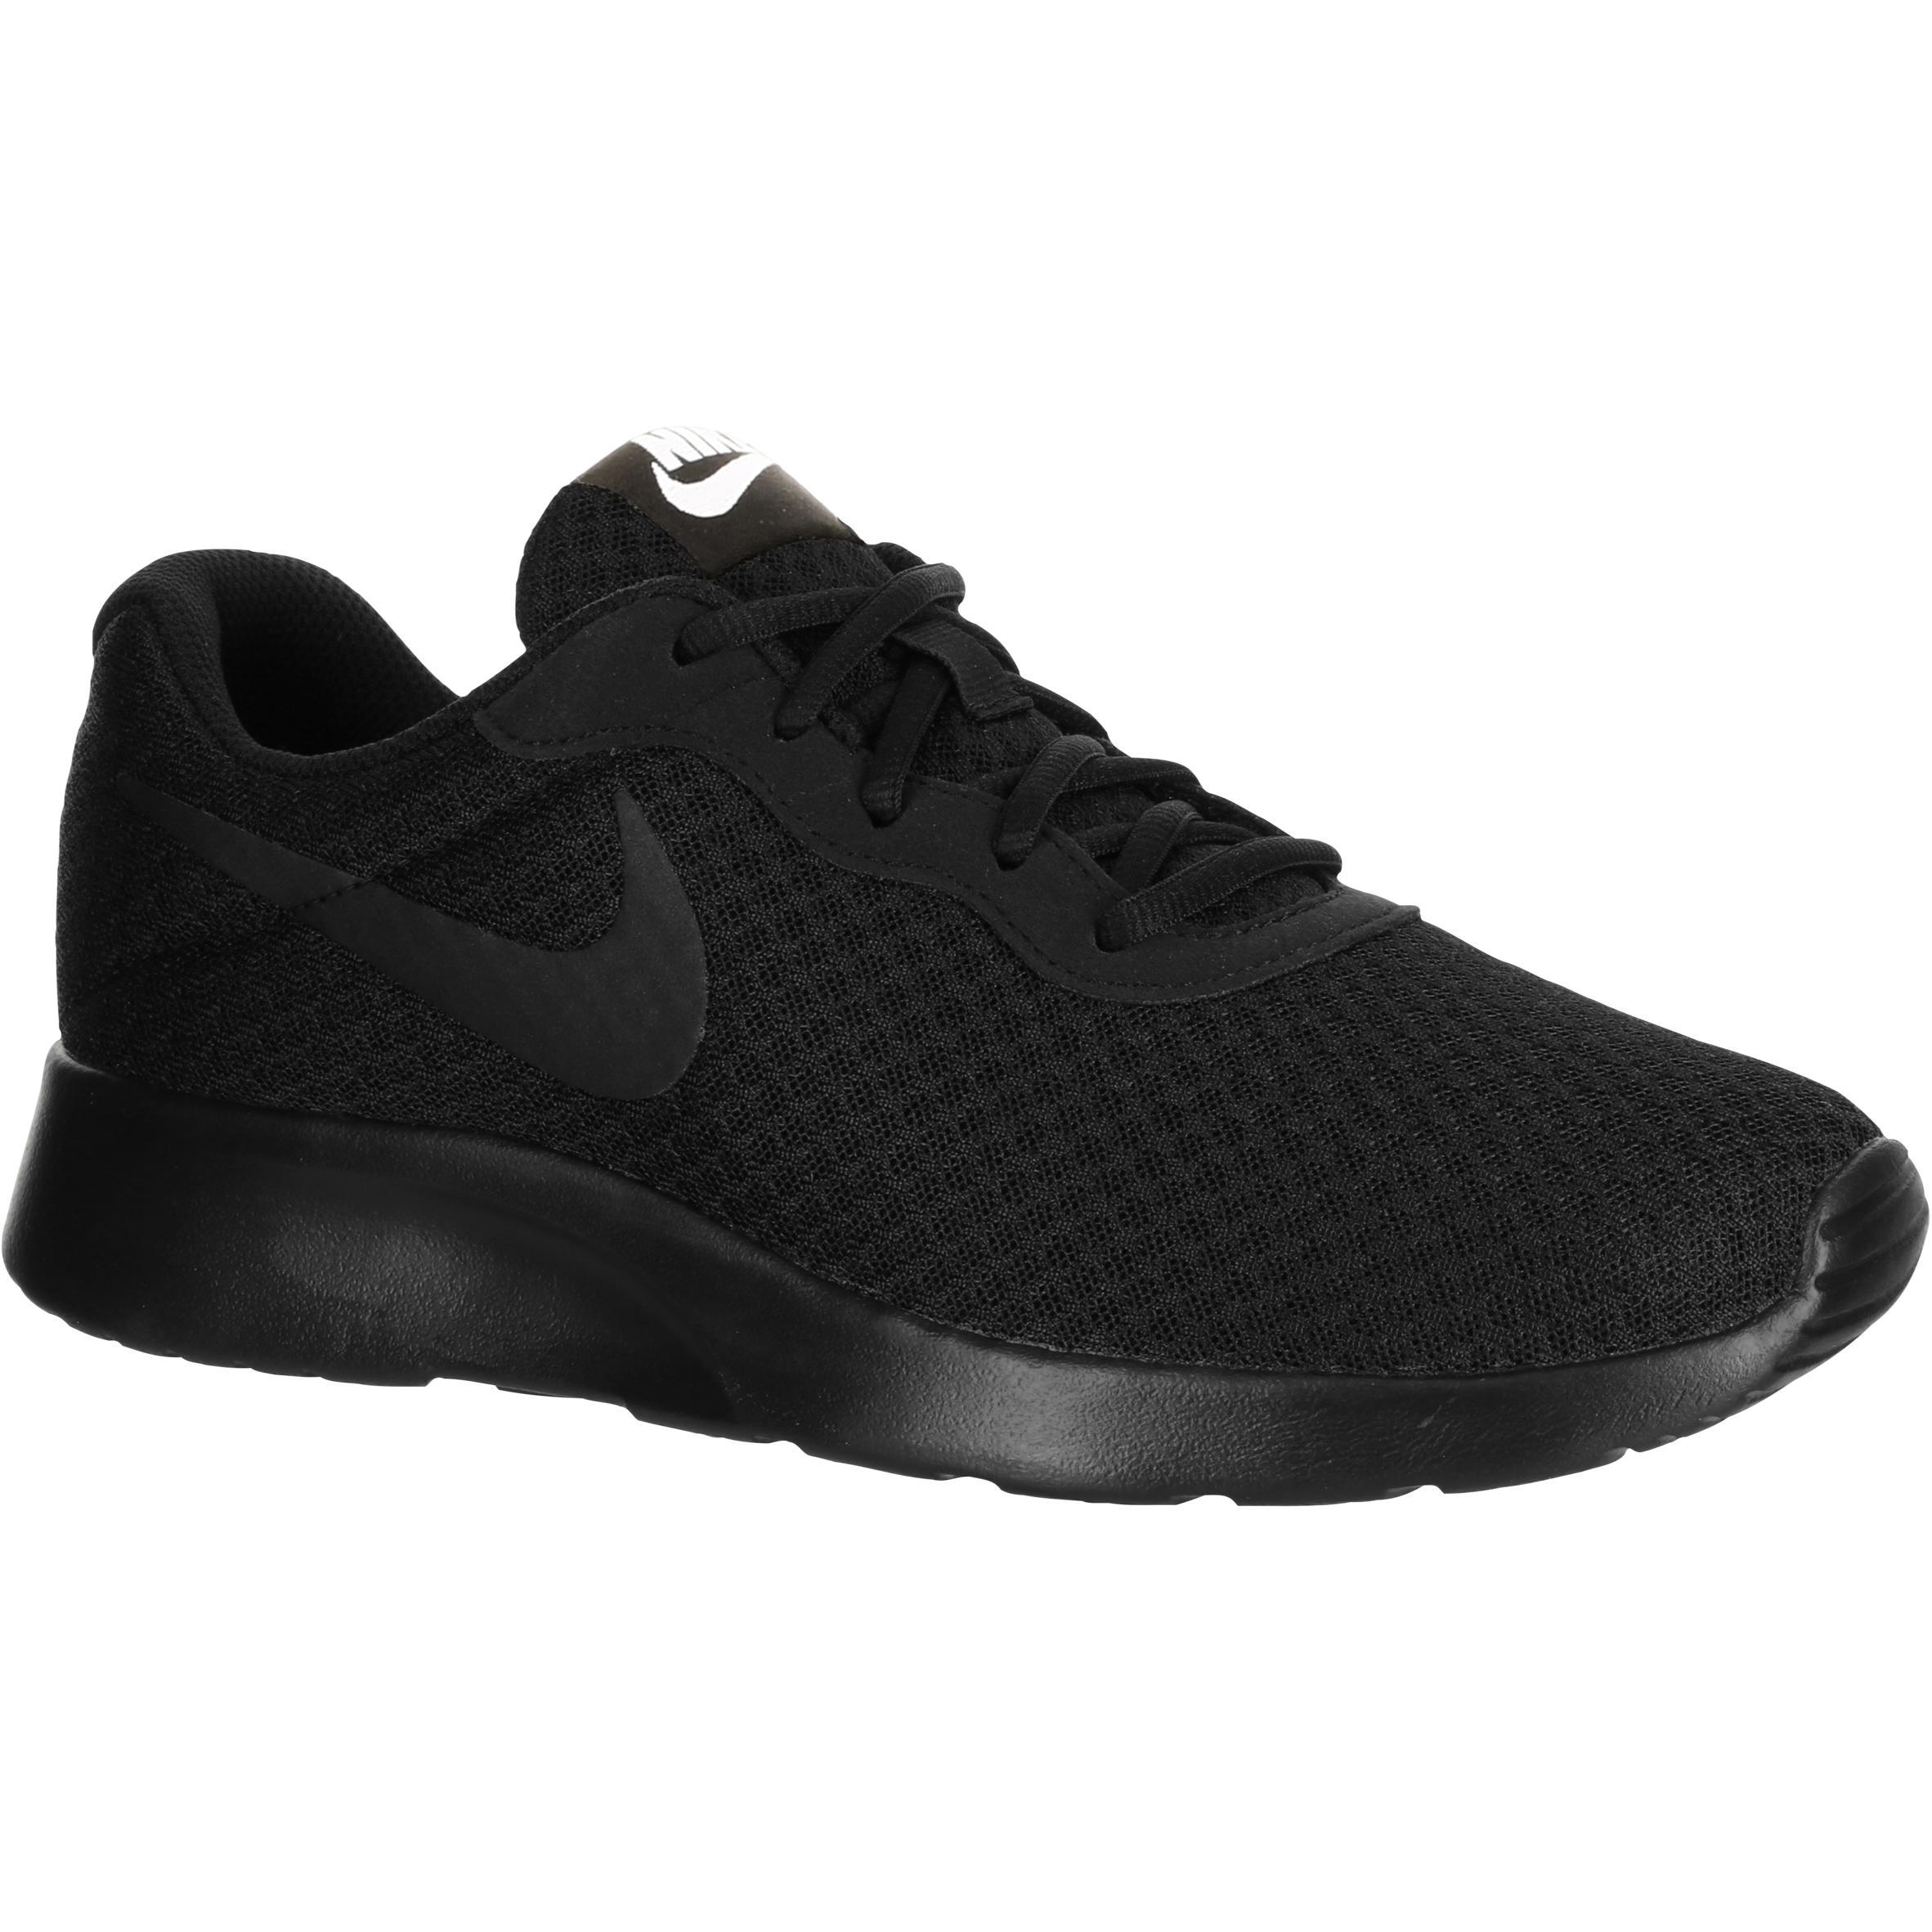 promo code 425f3 fbc65 Zapatillas de marcha deportiva para mujer Tanjun negro Nike   Decathlon